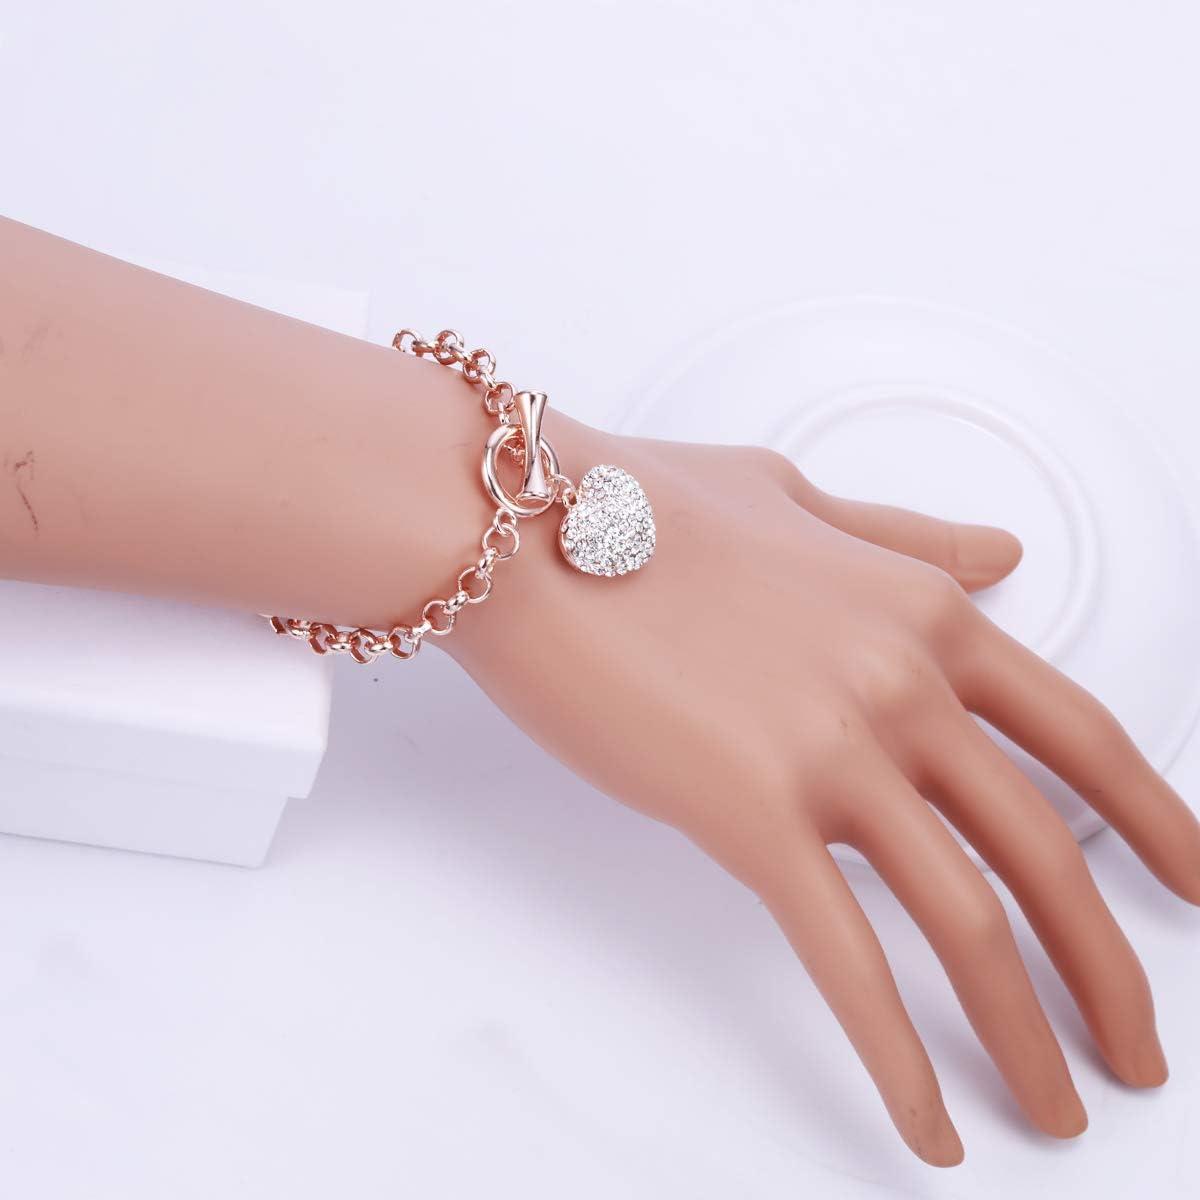 PJ Heart Crystal Charm Bracelet for Women Girls Toggle Clasp High Polished Trendy Love Heart-Shaped Link Chain Charms Bracelets Jewelry